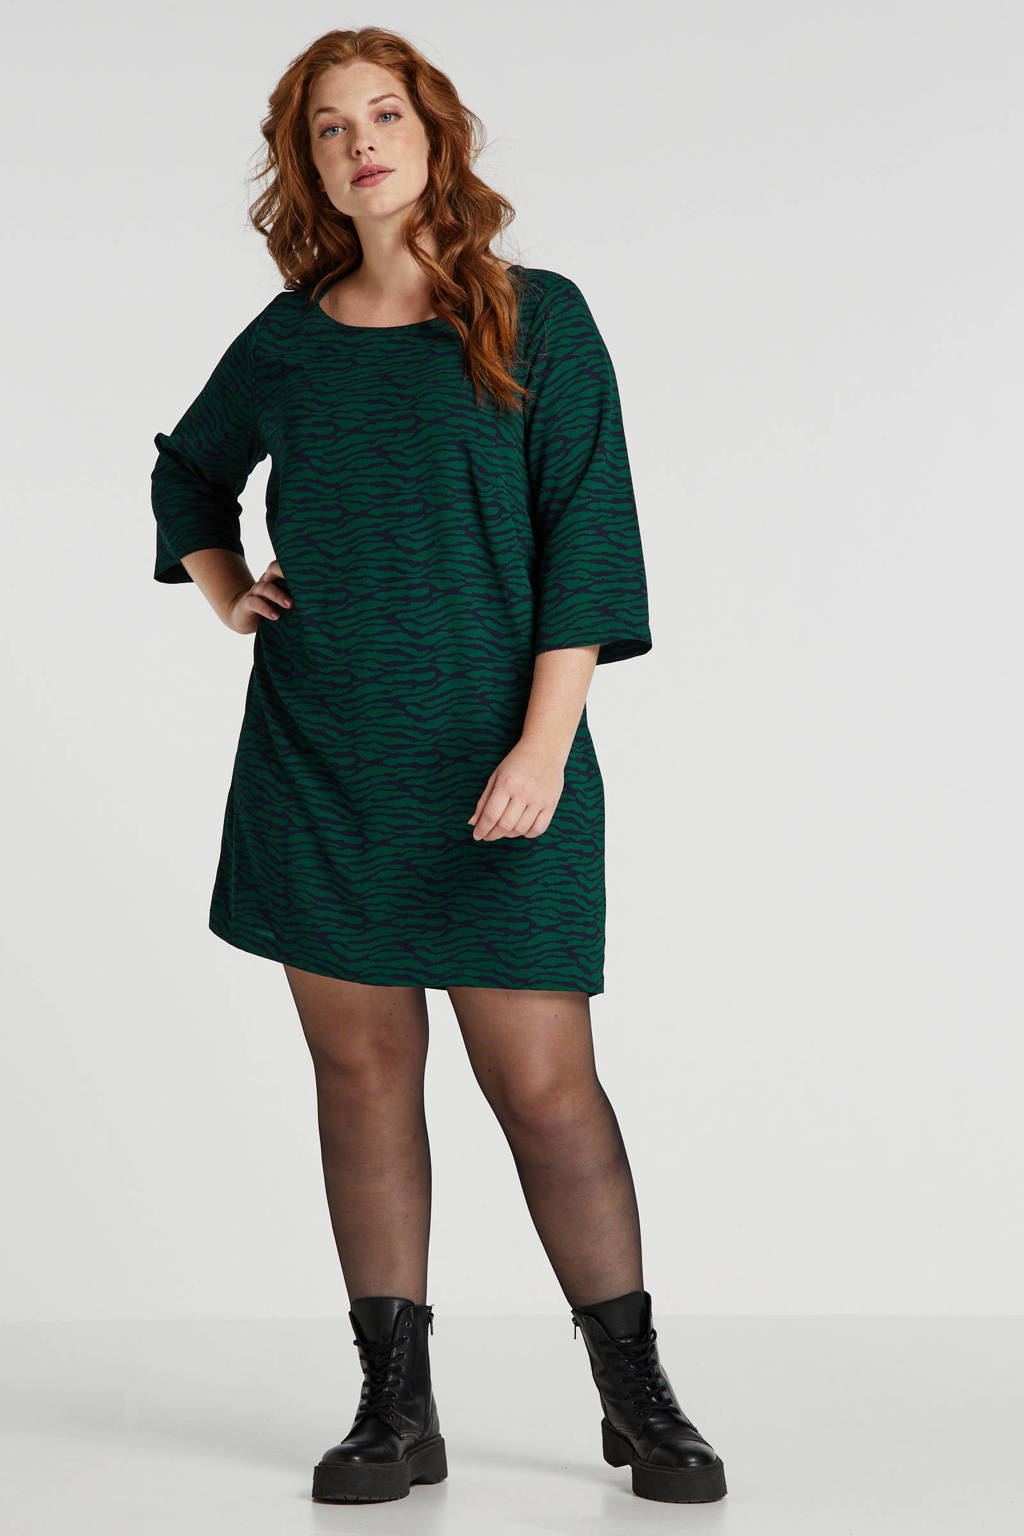 ONLY CARMAKOMA jersey jurk met zebraprint donkerblauw/groen, Donkerblauw/groen